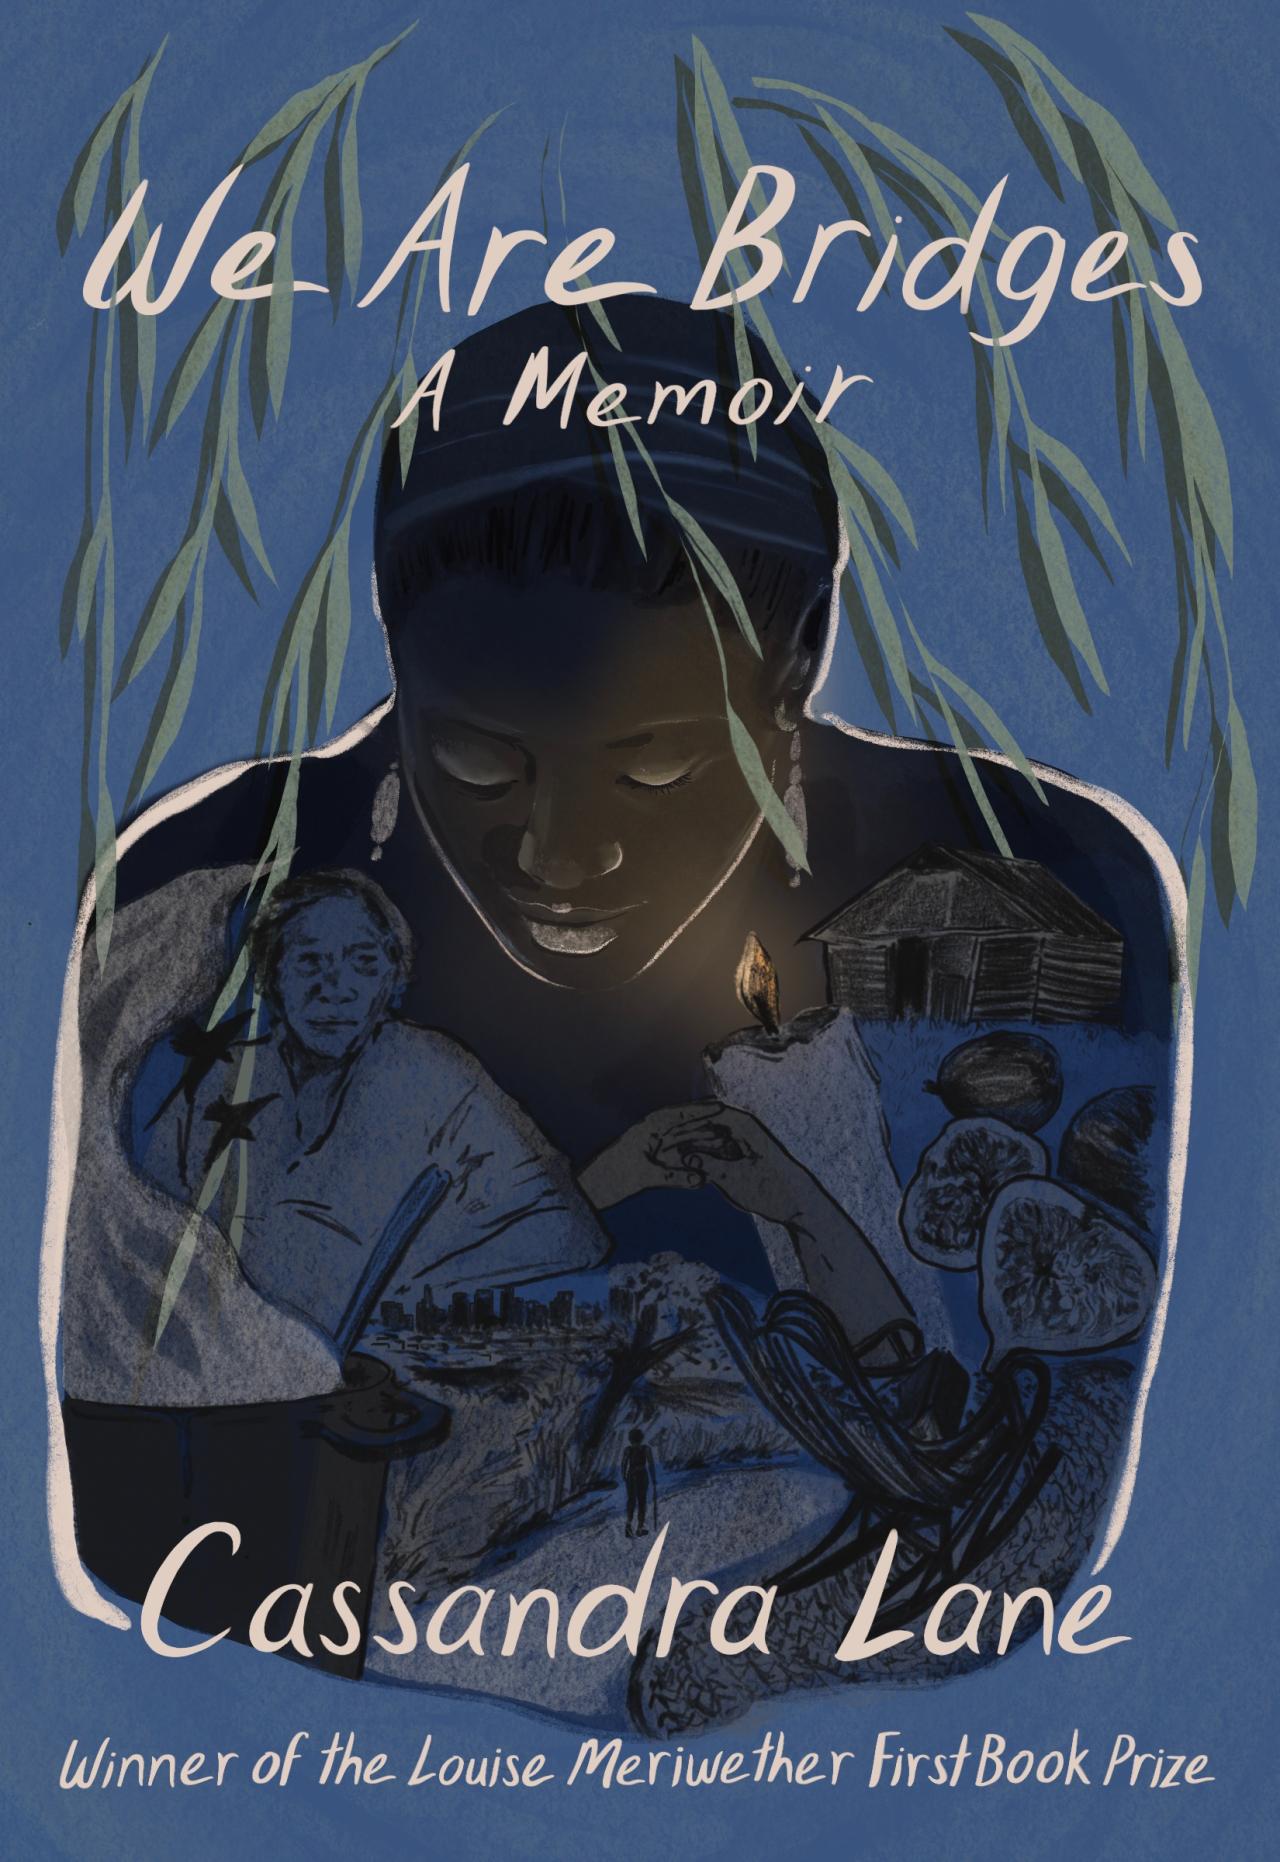 Cover of the memoir WE ARE BRIDGES